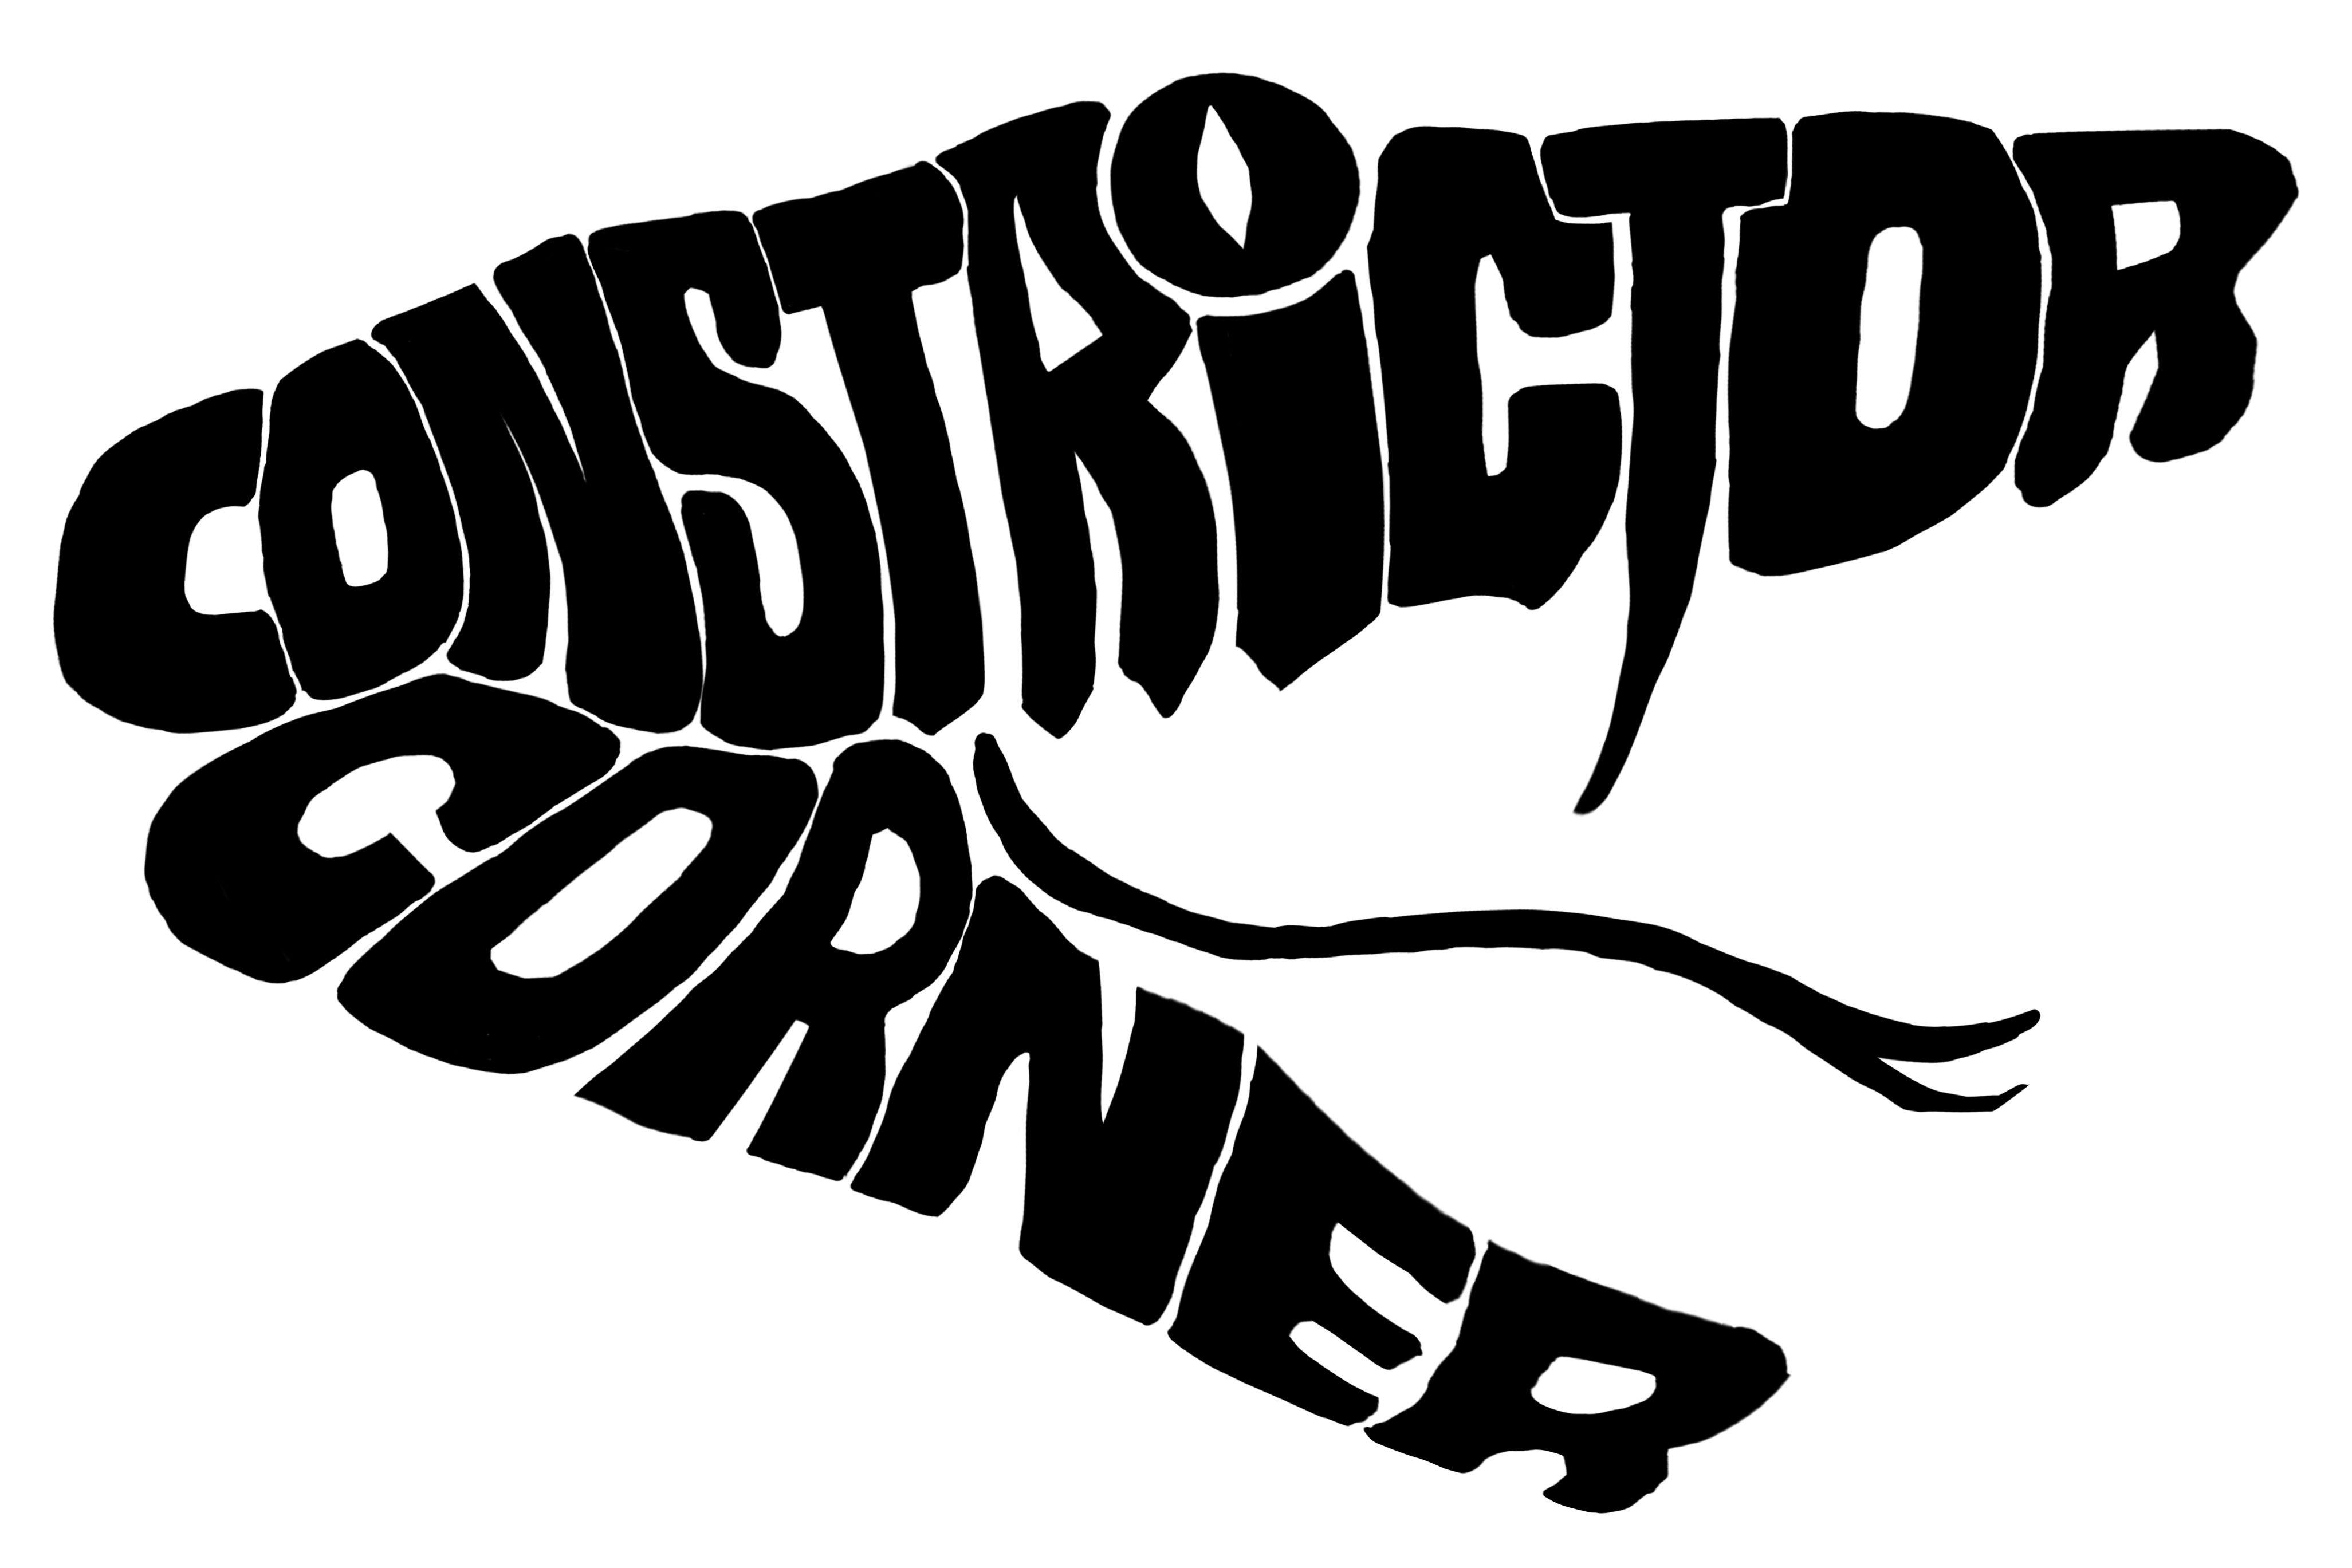 Constrictor Corner Logo (Alternate)